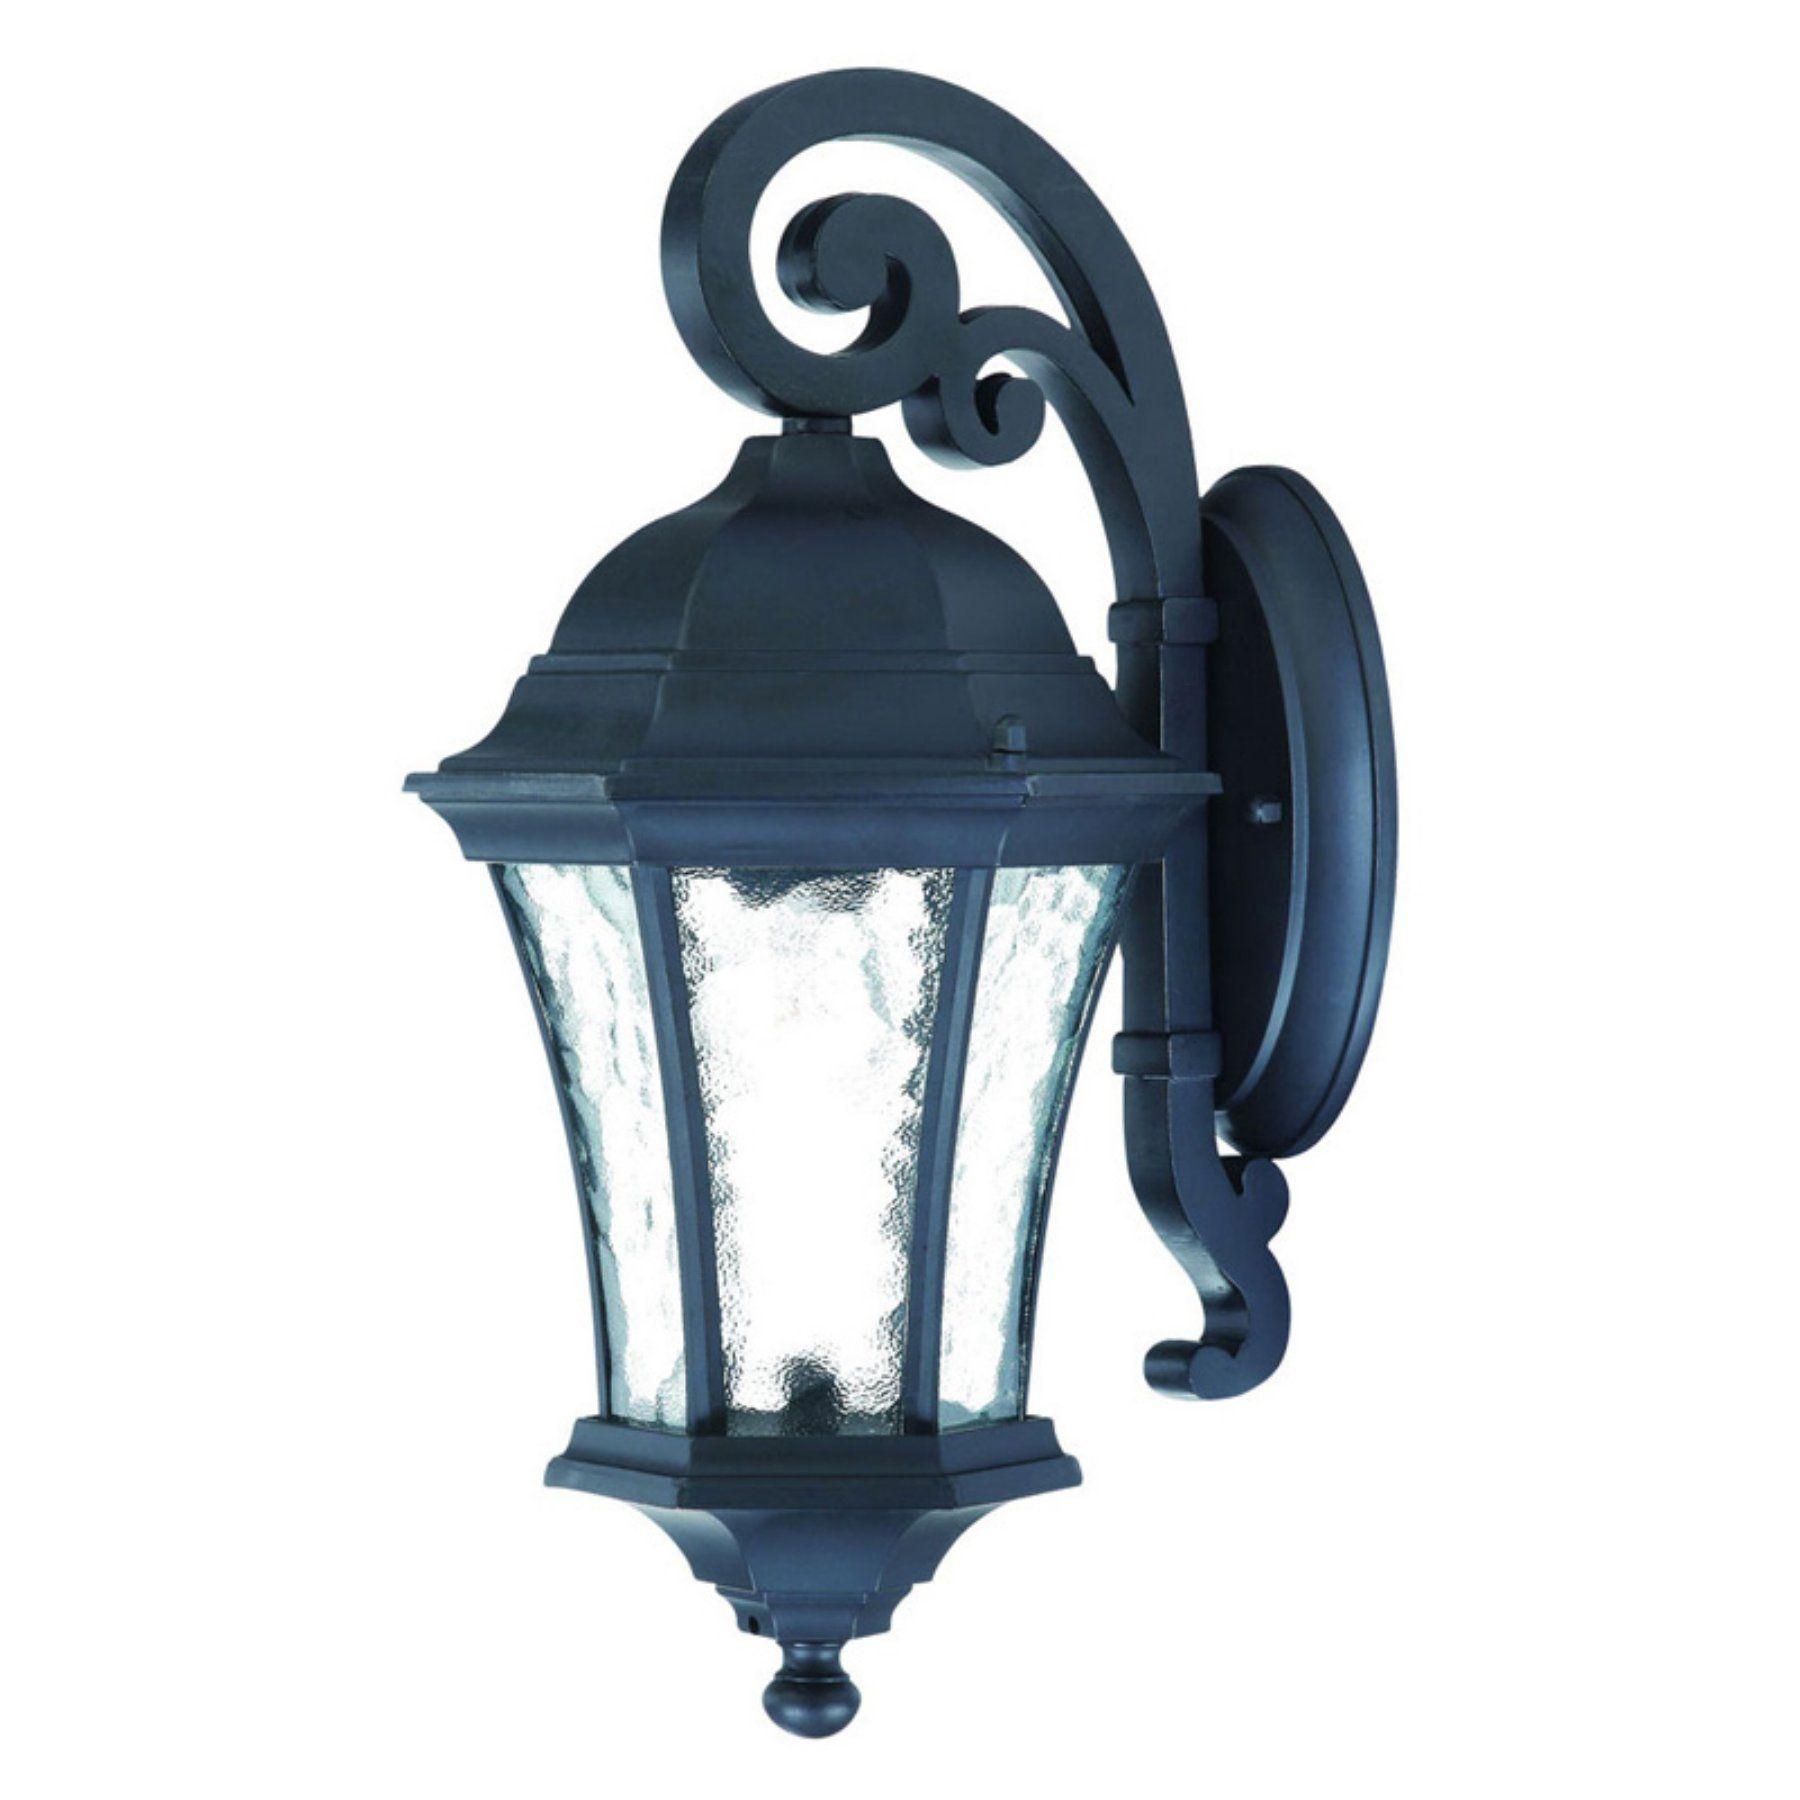 Acclaim lighting waverly outdoor wall mount light fixture 3602bk acclaim lighting waverly outdoor wall mount light fixture 3602bc arubaitofo Images